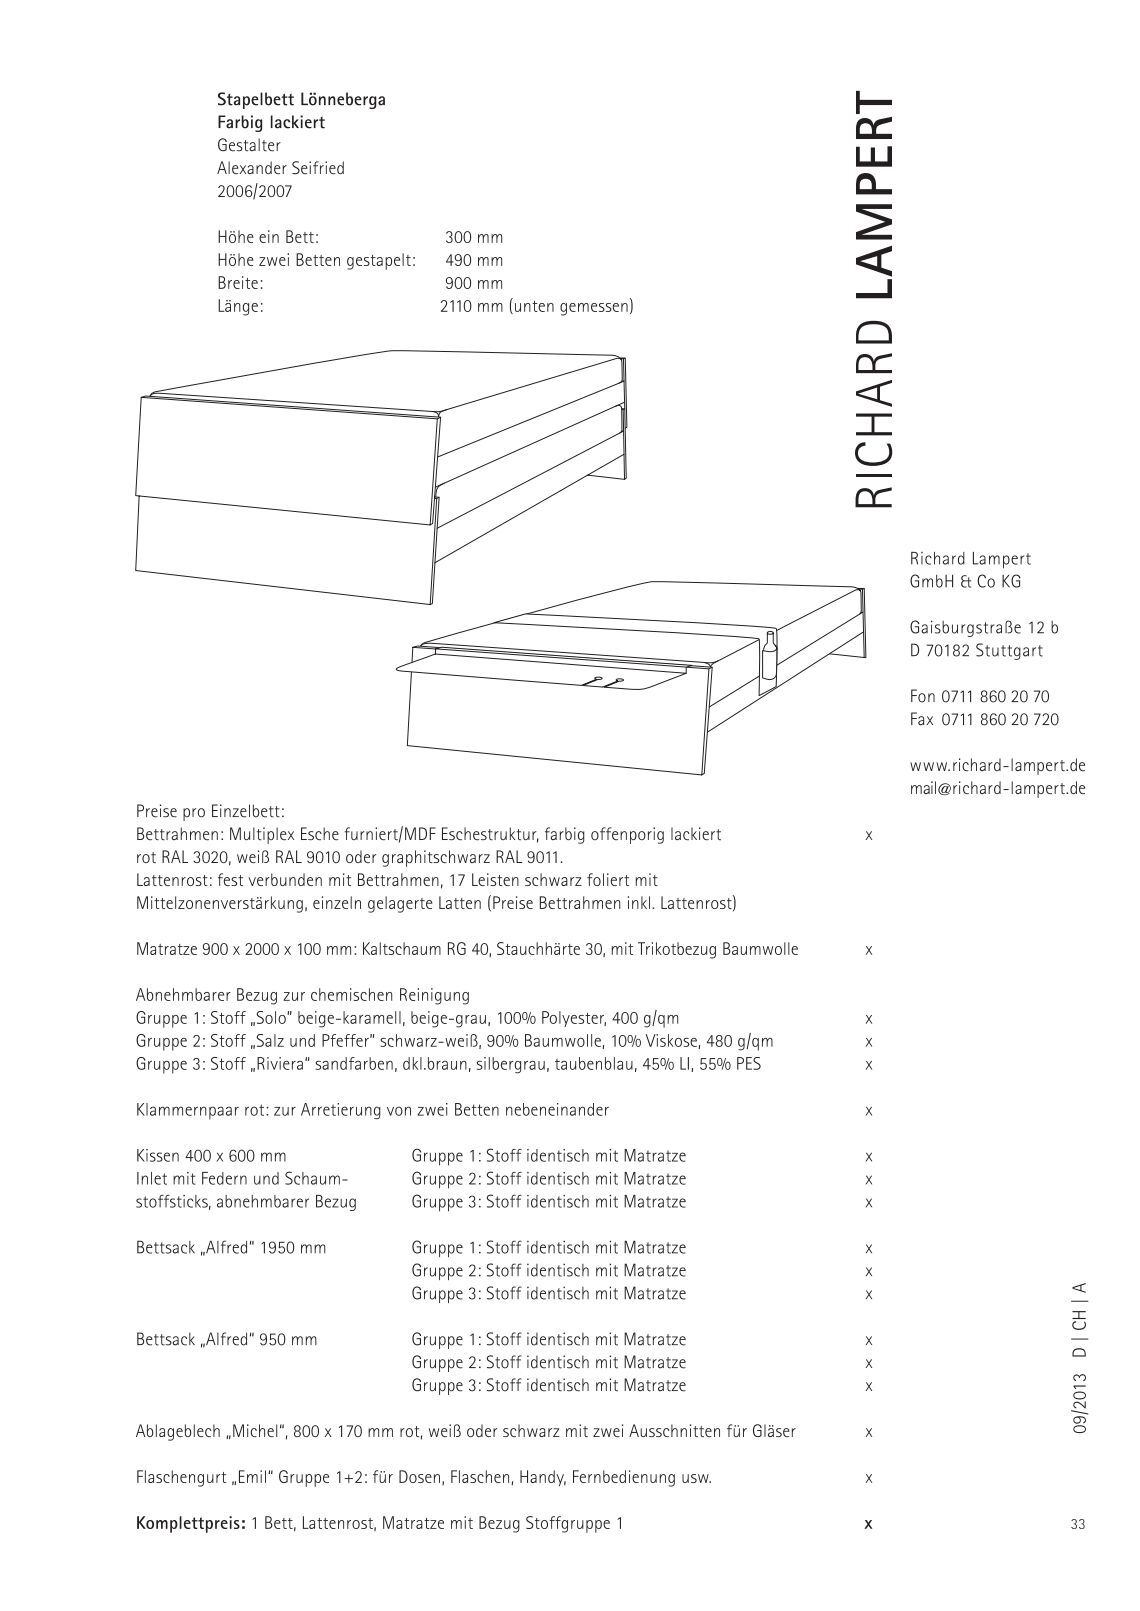 9 free magazines from richard lampert de. Black Bedroom Furniture Sets. Home Design Ideas